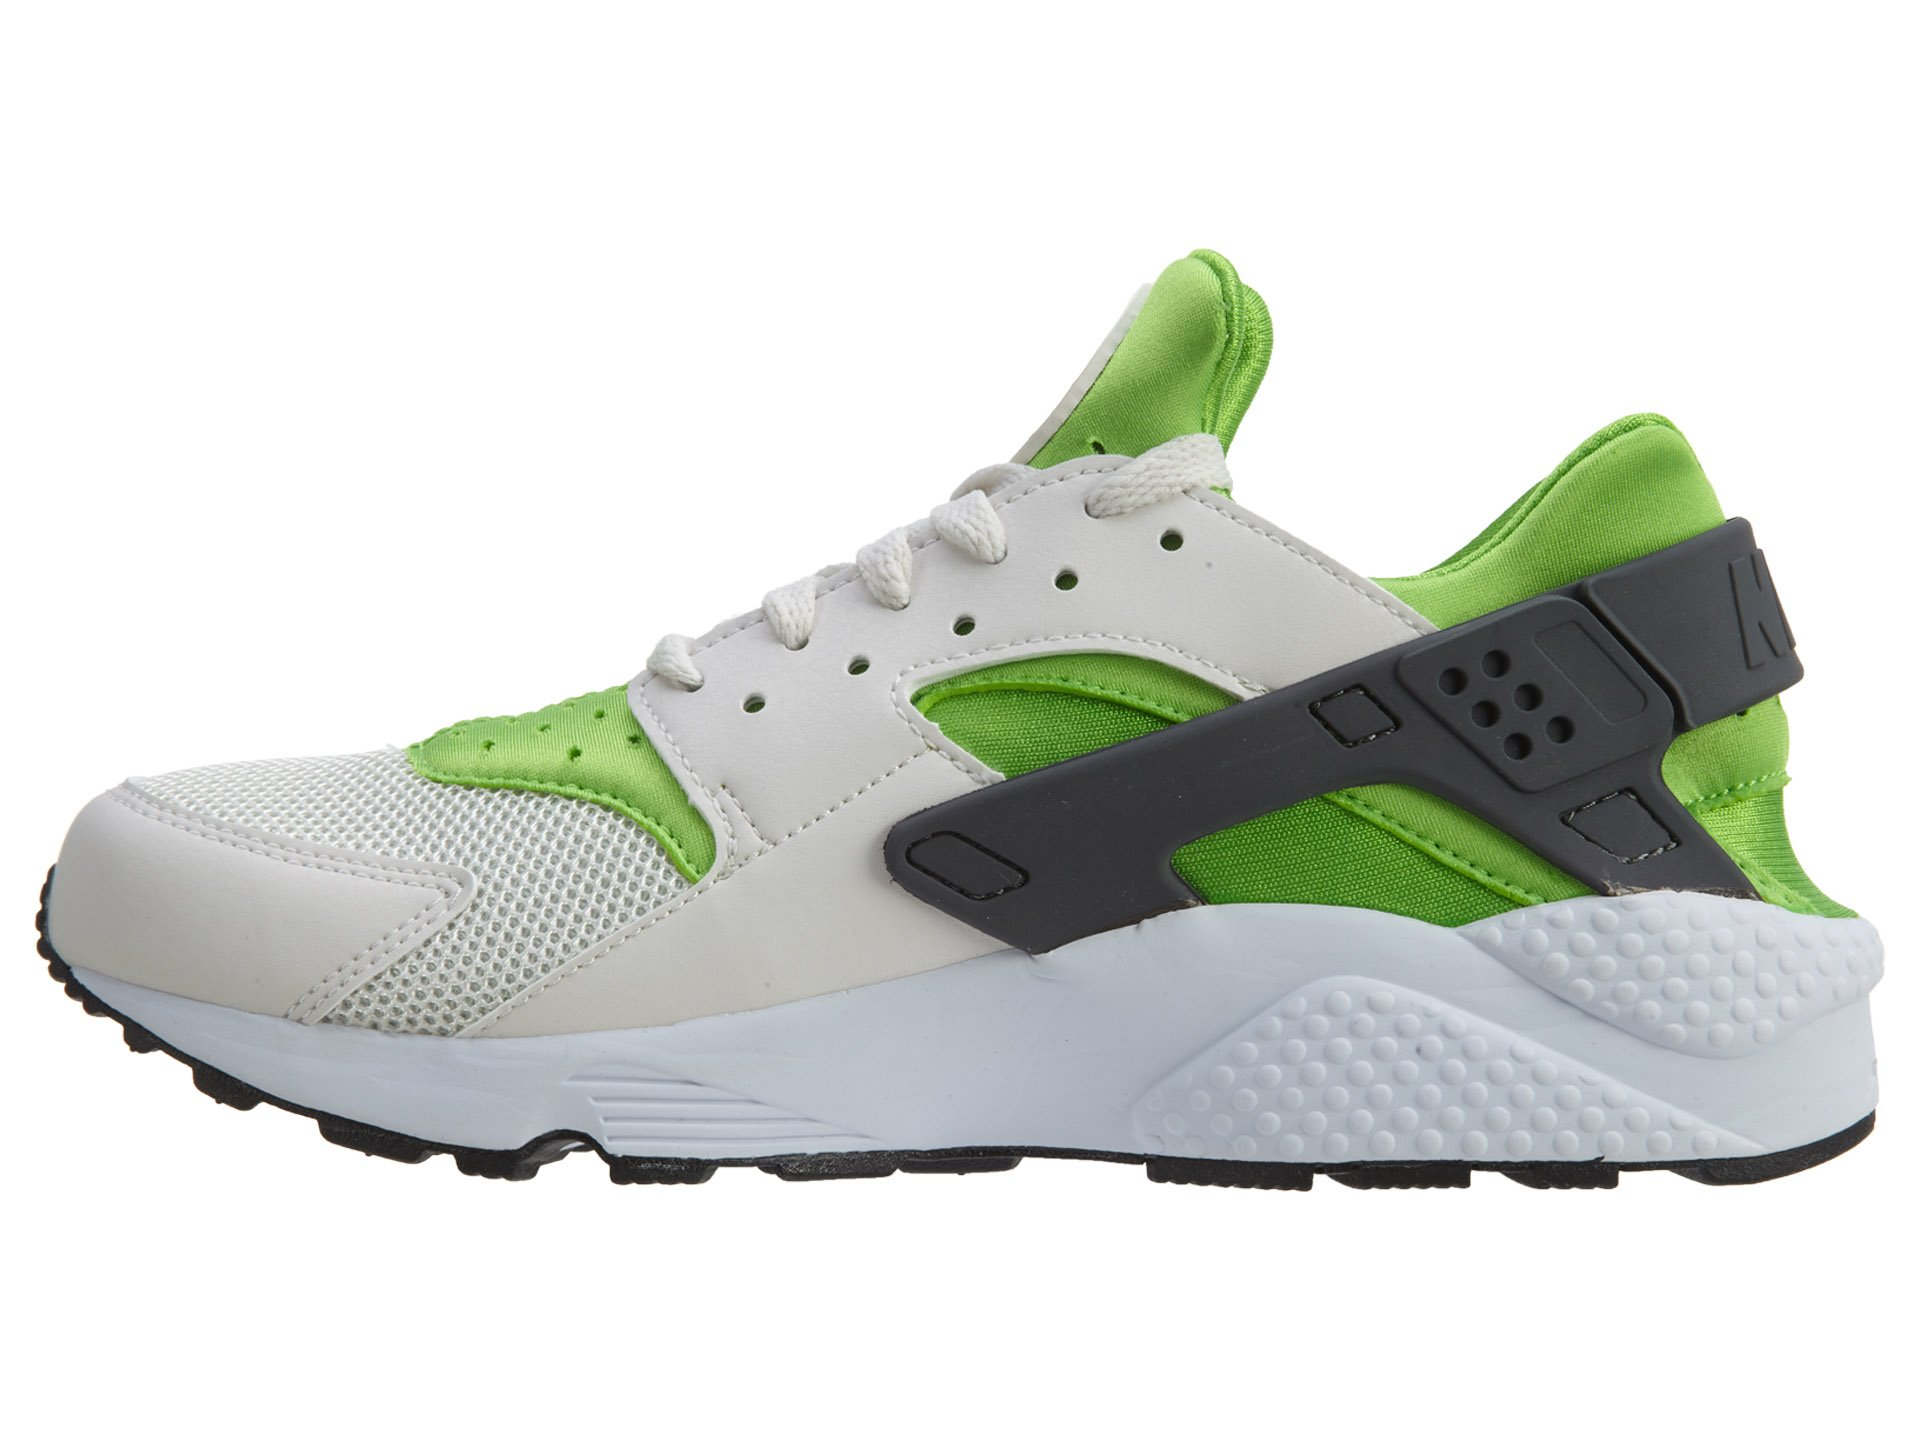 Nike Men's Air Huarache Actn Green/Vvd Orng Phntm Wht Running Shoe 10.5 Men US by NIKE (Image #4)